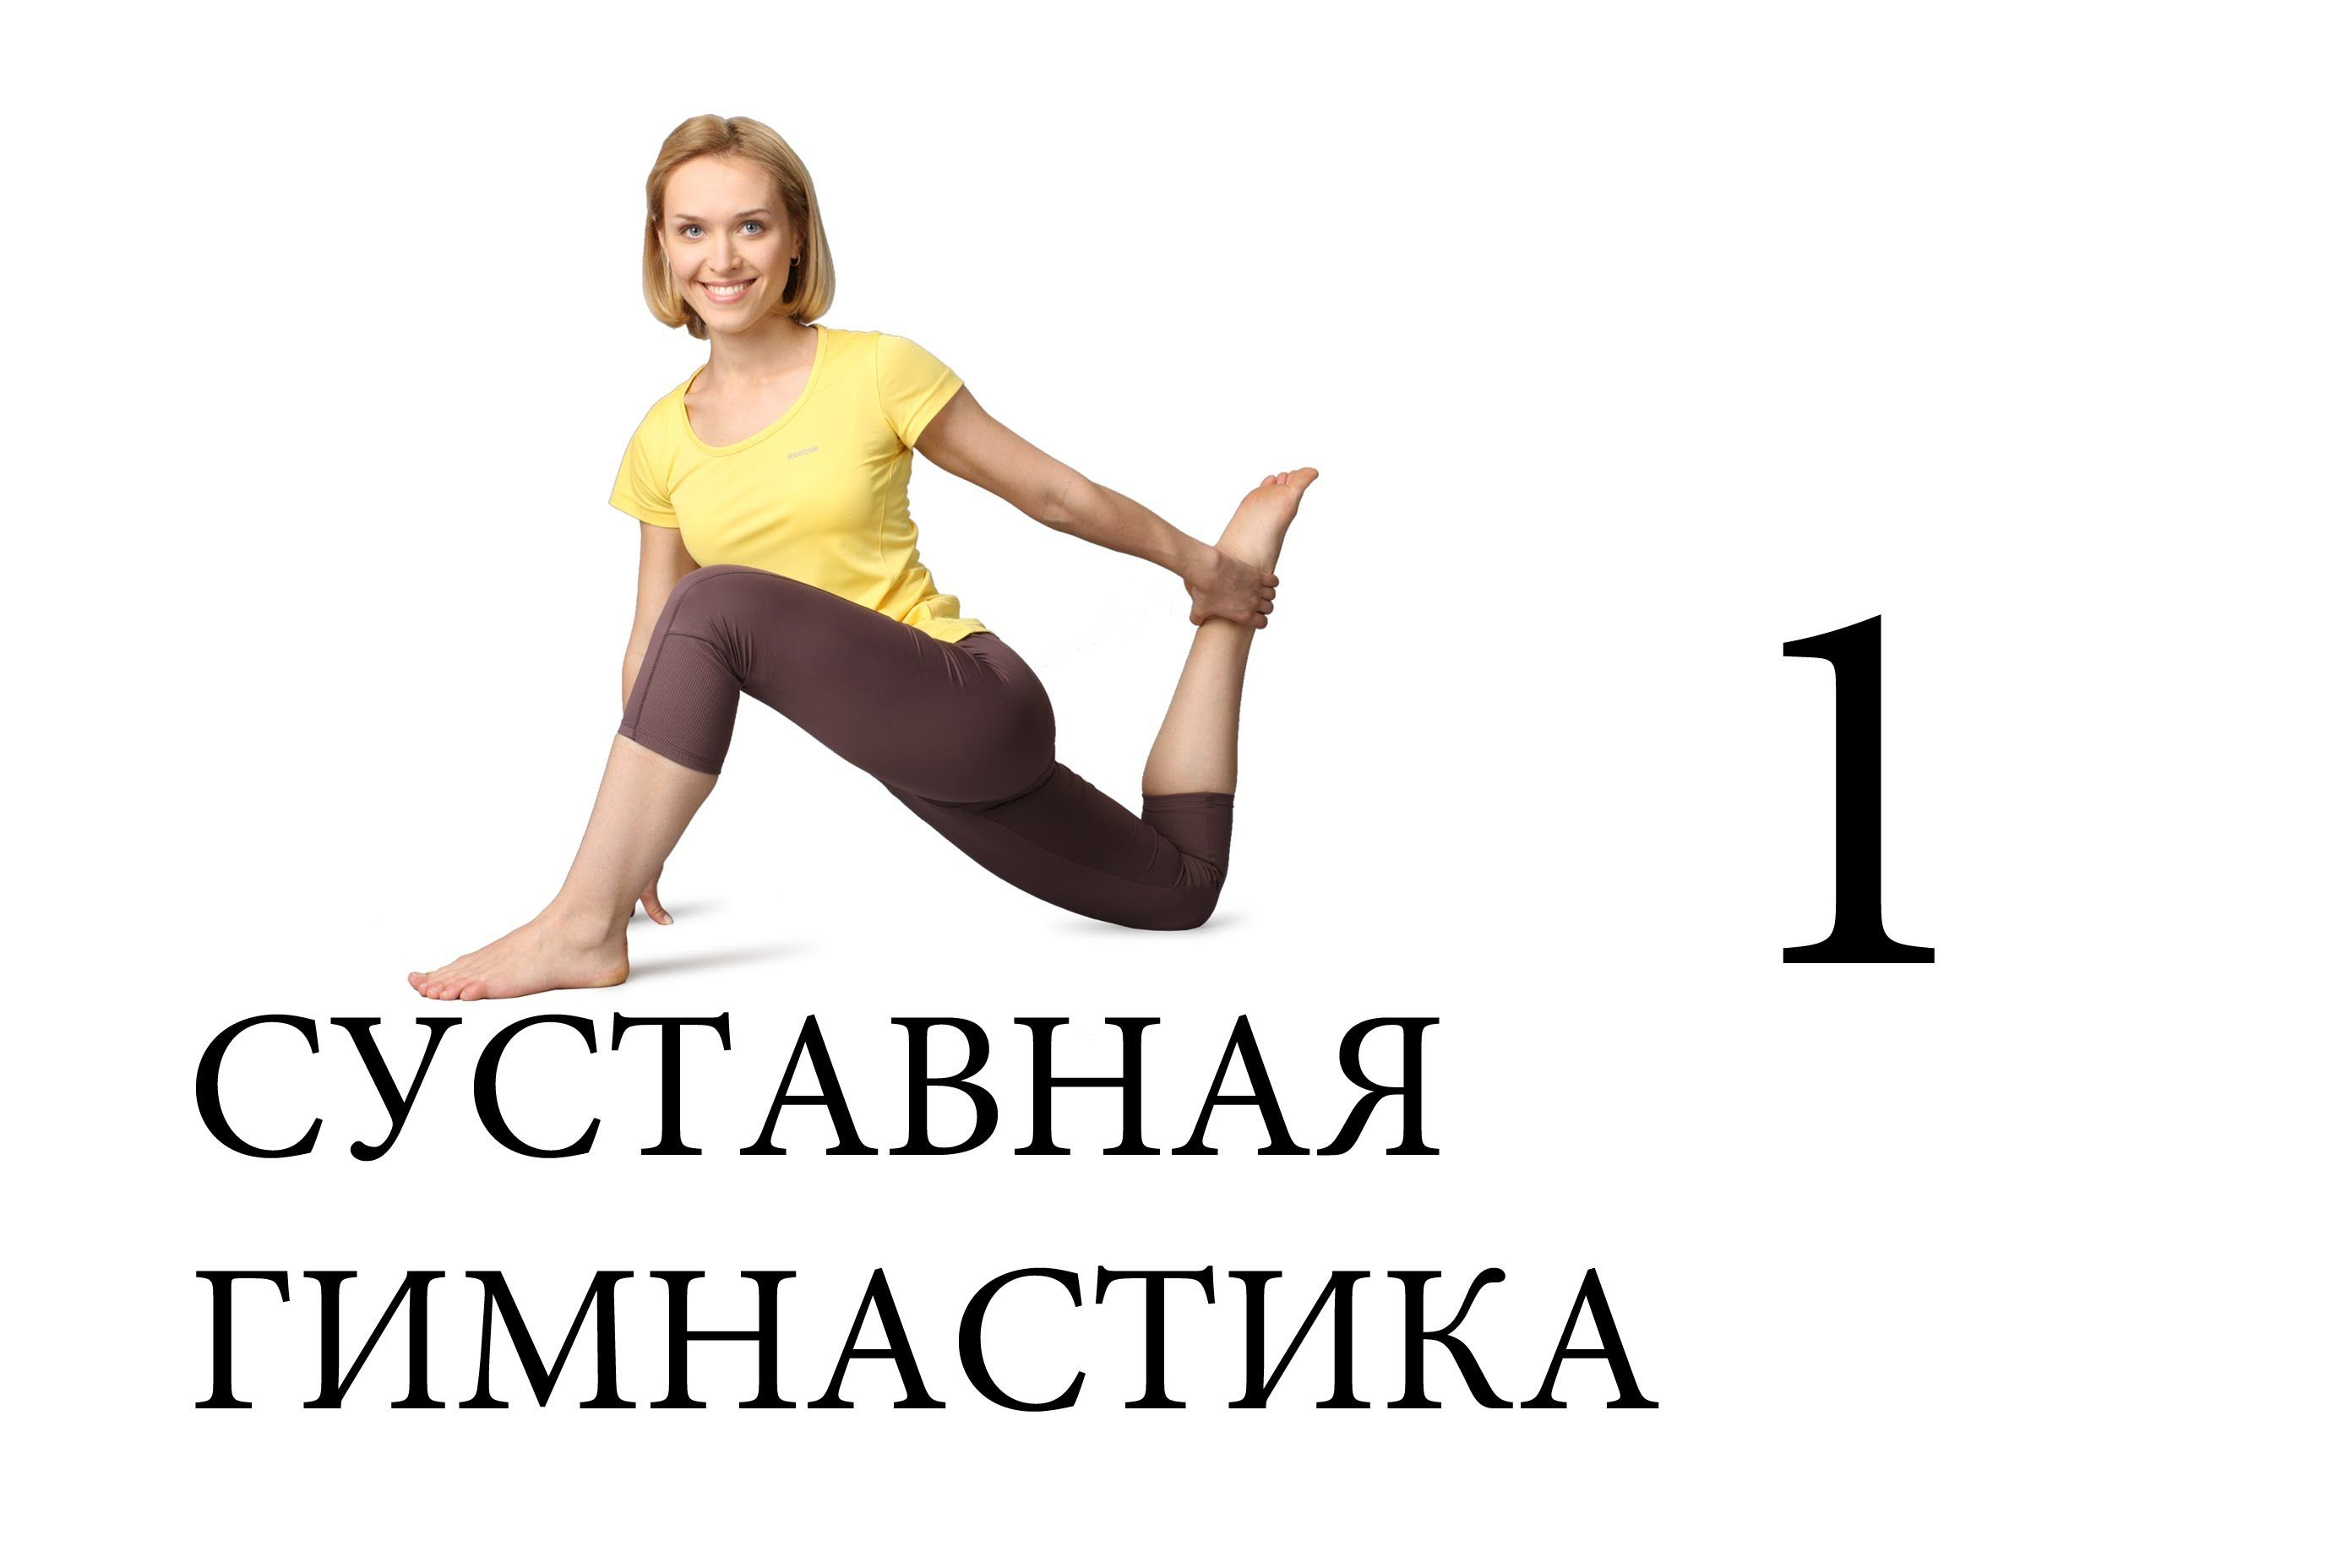 Суставная гимнастика видео амплитуда движений в тазобедренном суставе снижена